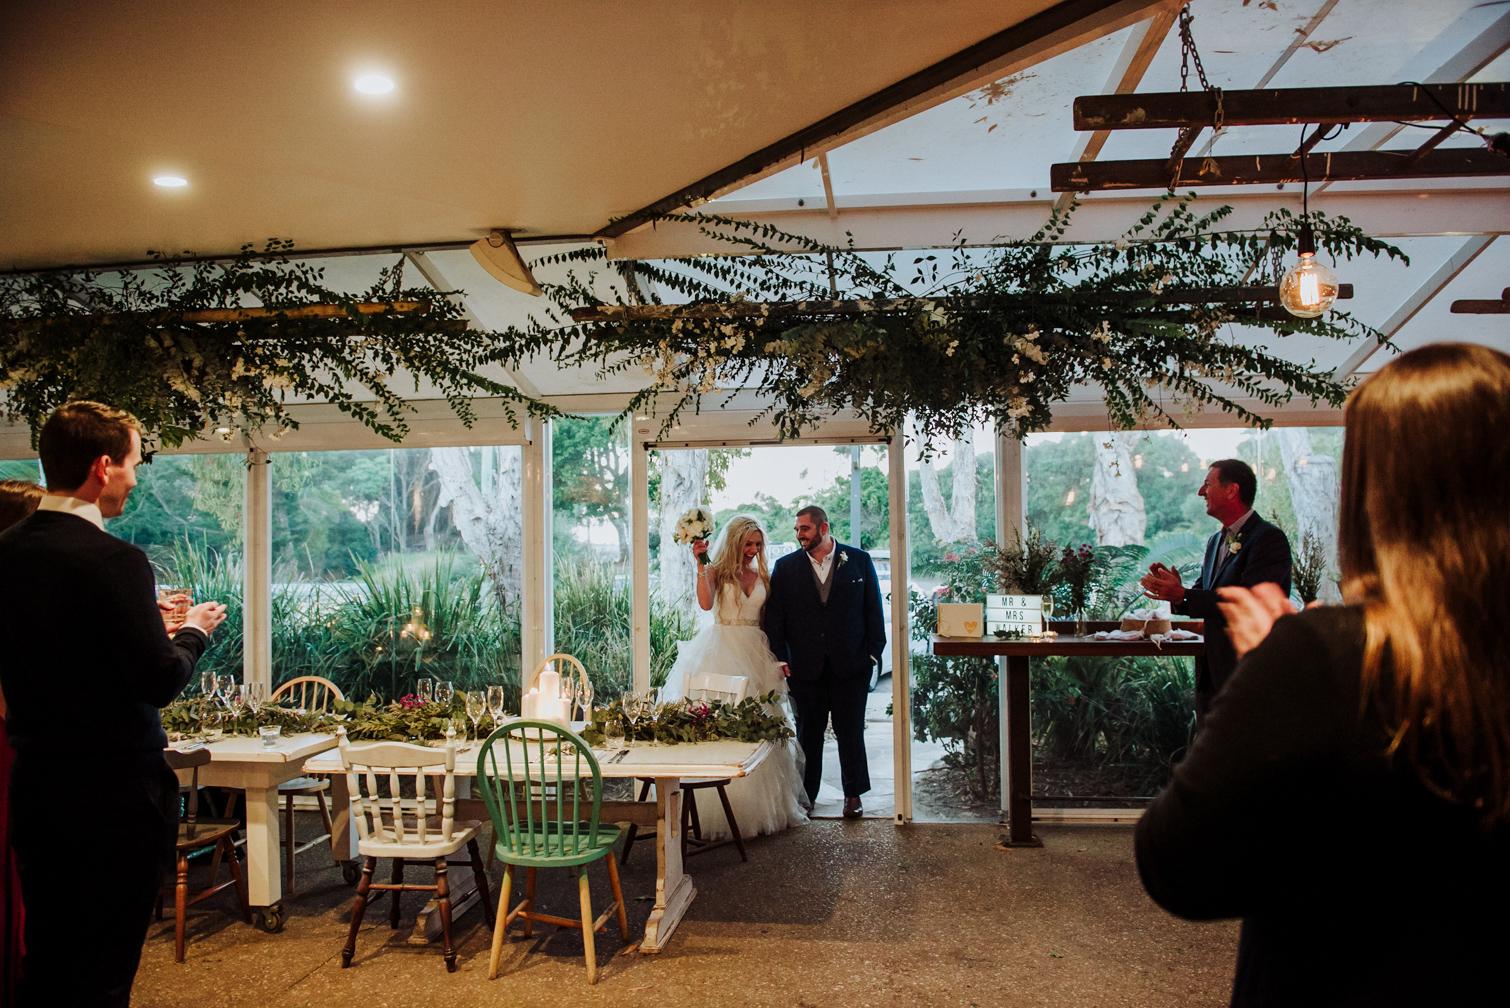 The_Belongil_Byron_Bay_Weddings_New_Black_Studios-181.jpg